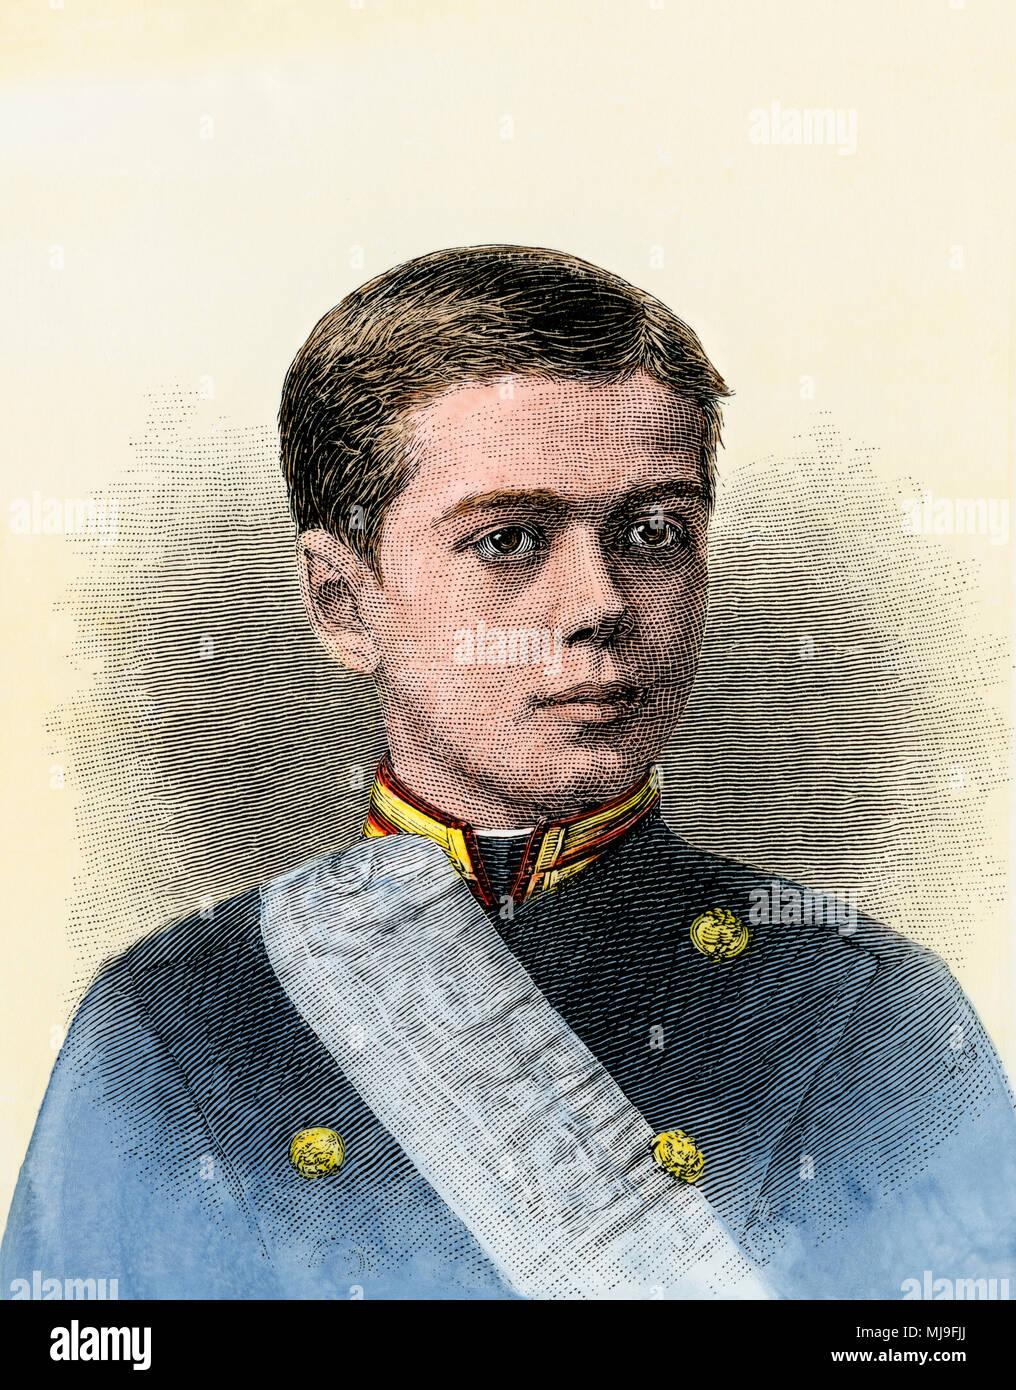 Czar Nicholas II as a boy, when he was the Grand Duke Nicholas Alexandrovitch, the heir-apparent, 1880s. Hand-colored woodcut - Stock Image